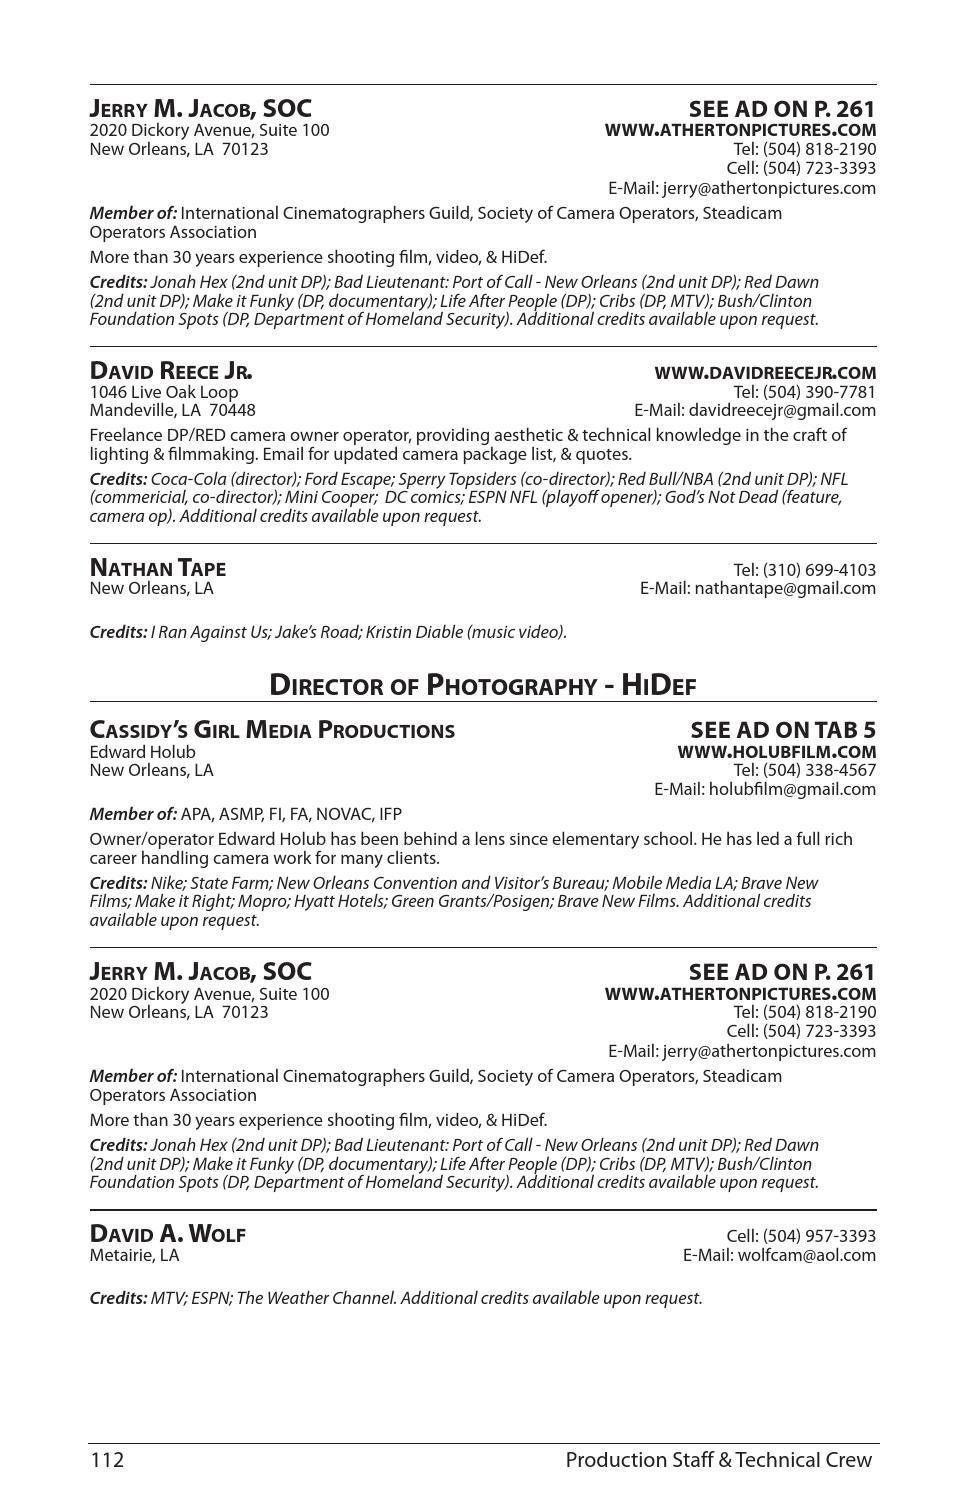 Louisiana Entertainment Sourcebook 2014 - 2015 by Oz